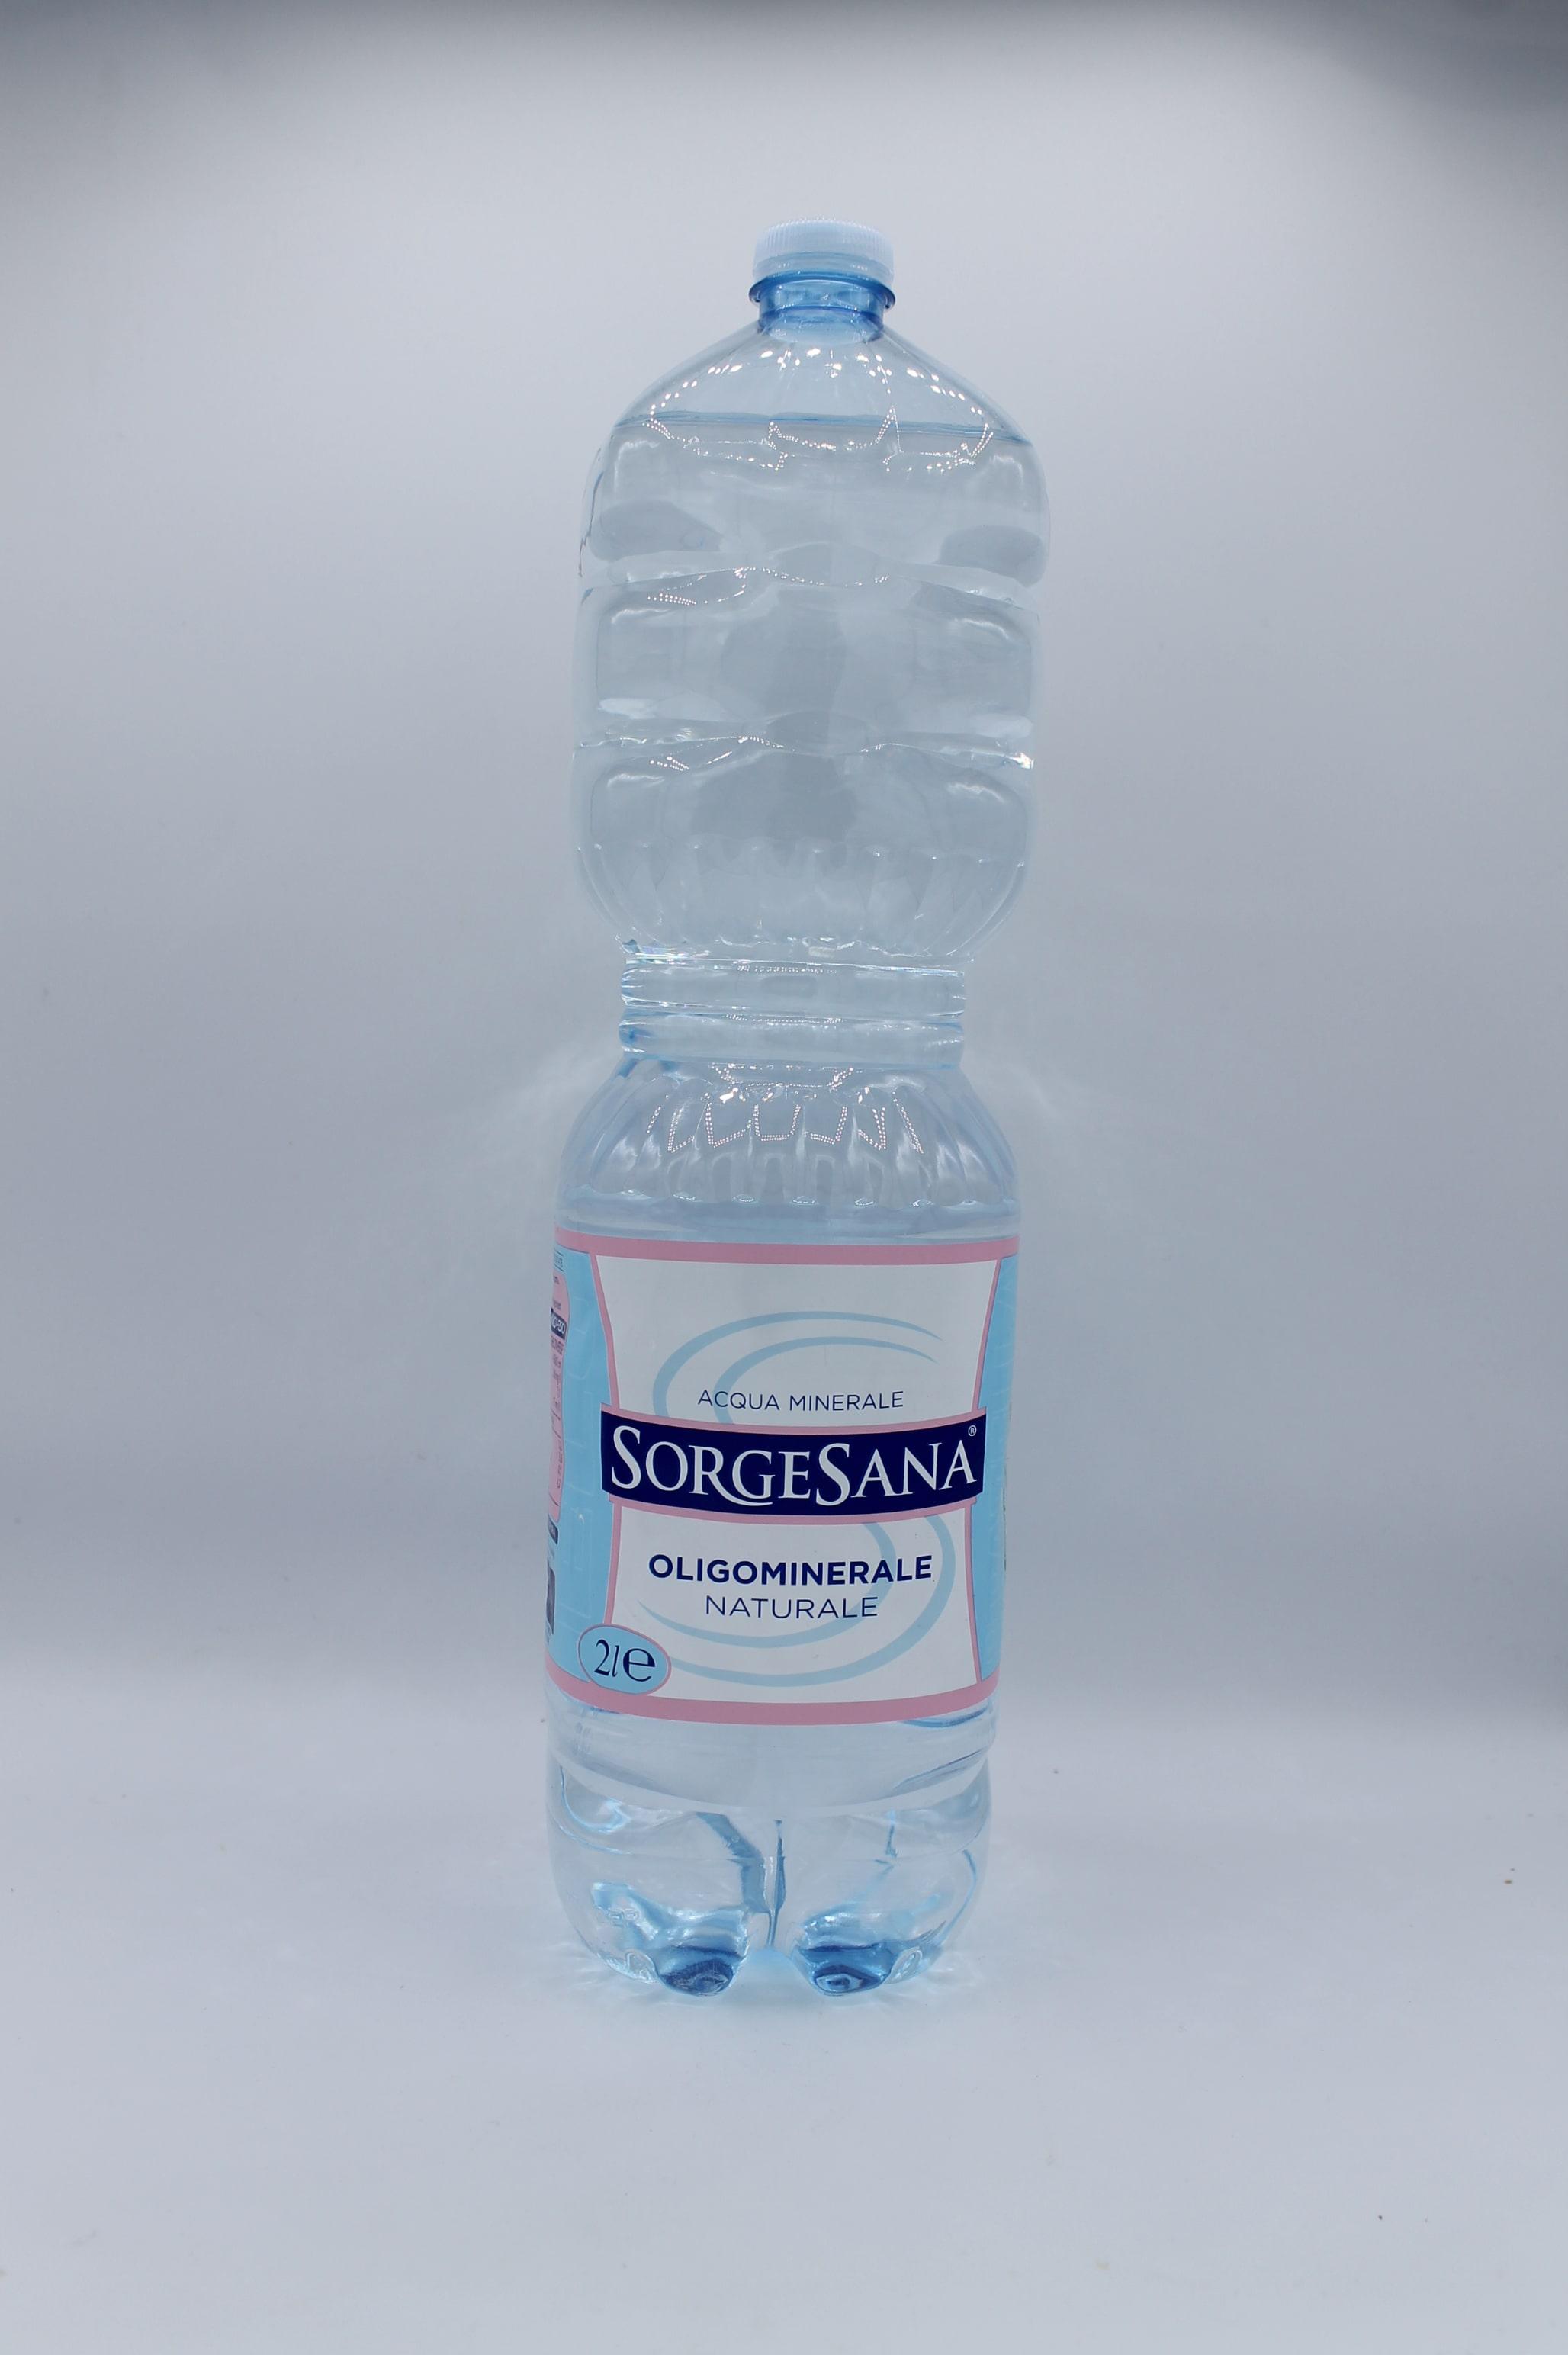 Acqua minerale naturale Sorgesana.